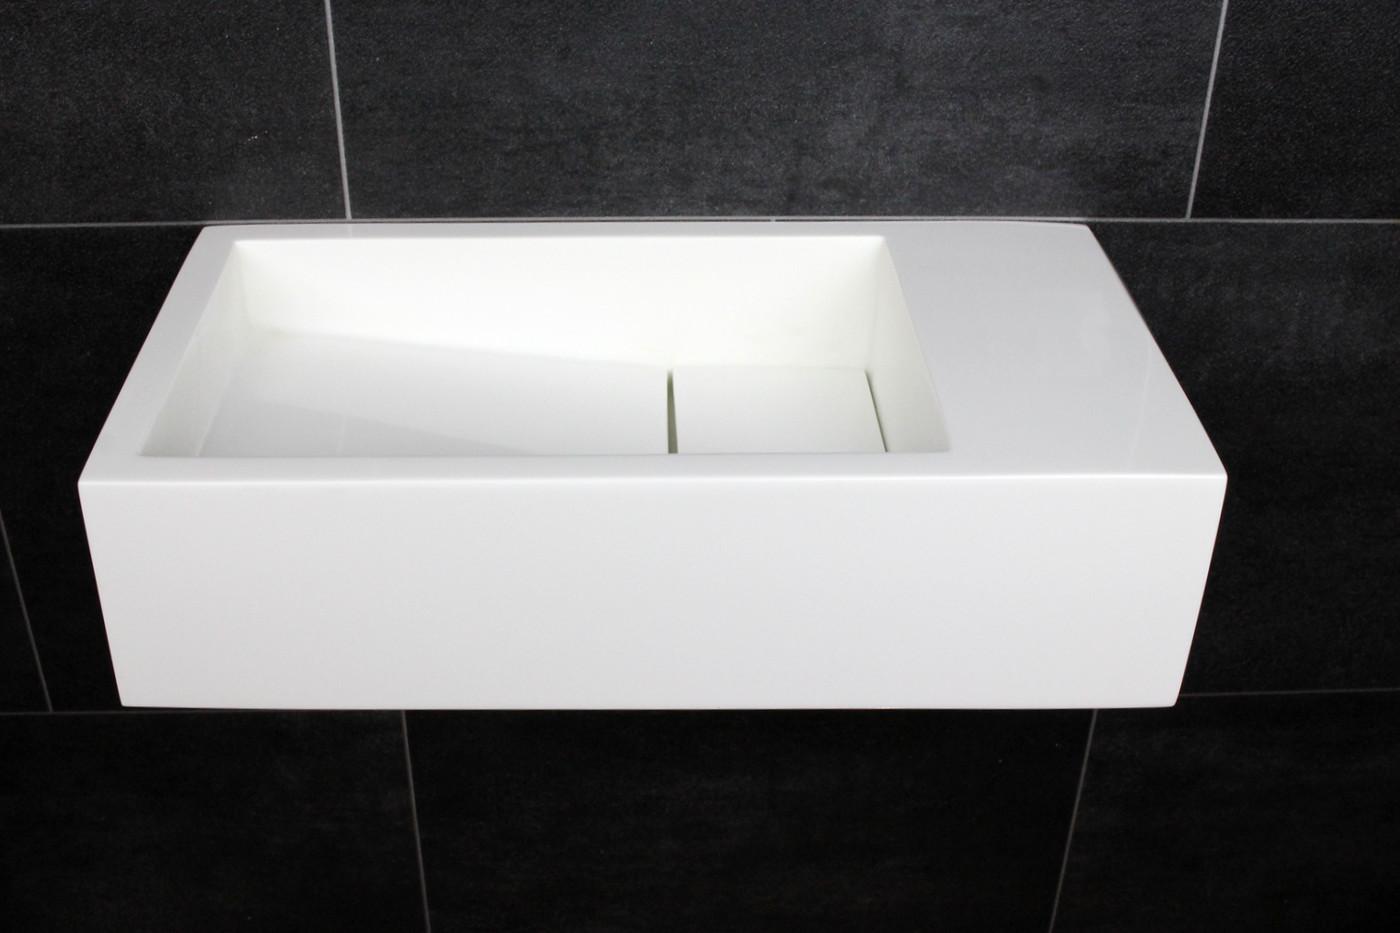 Luca Sanitair  fontein 35x18,5x9h in mineral stone zonder kraangat, l+r te plaatsen, ophang doorboren wit glans